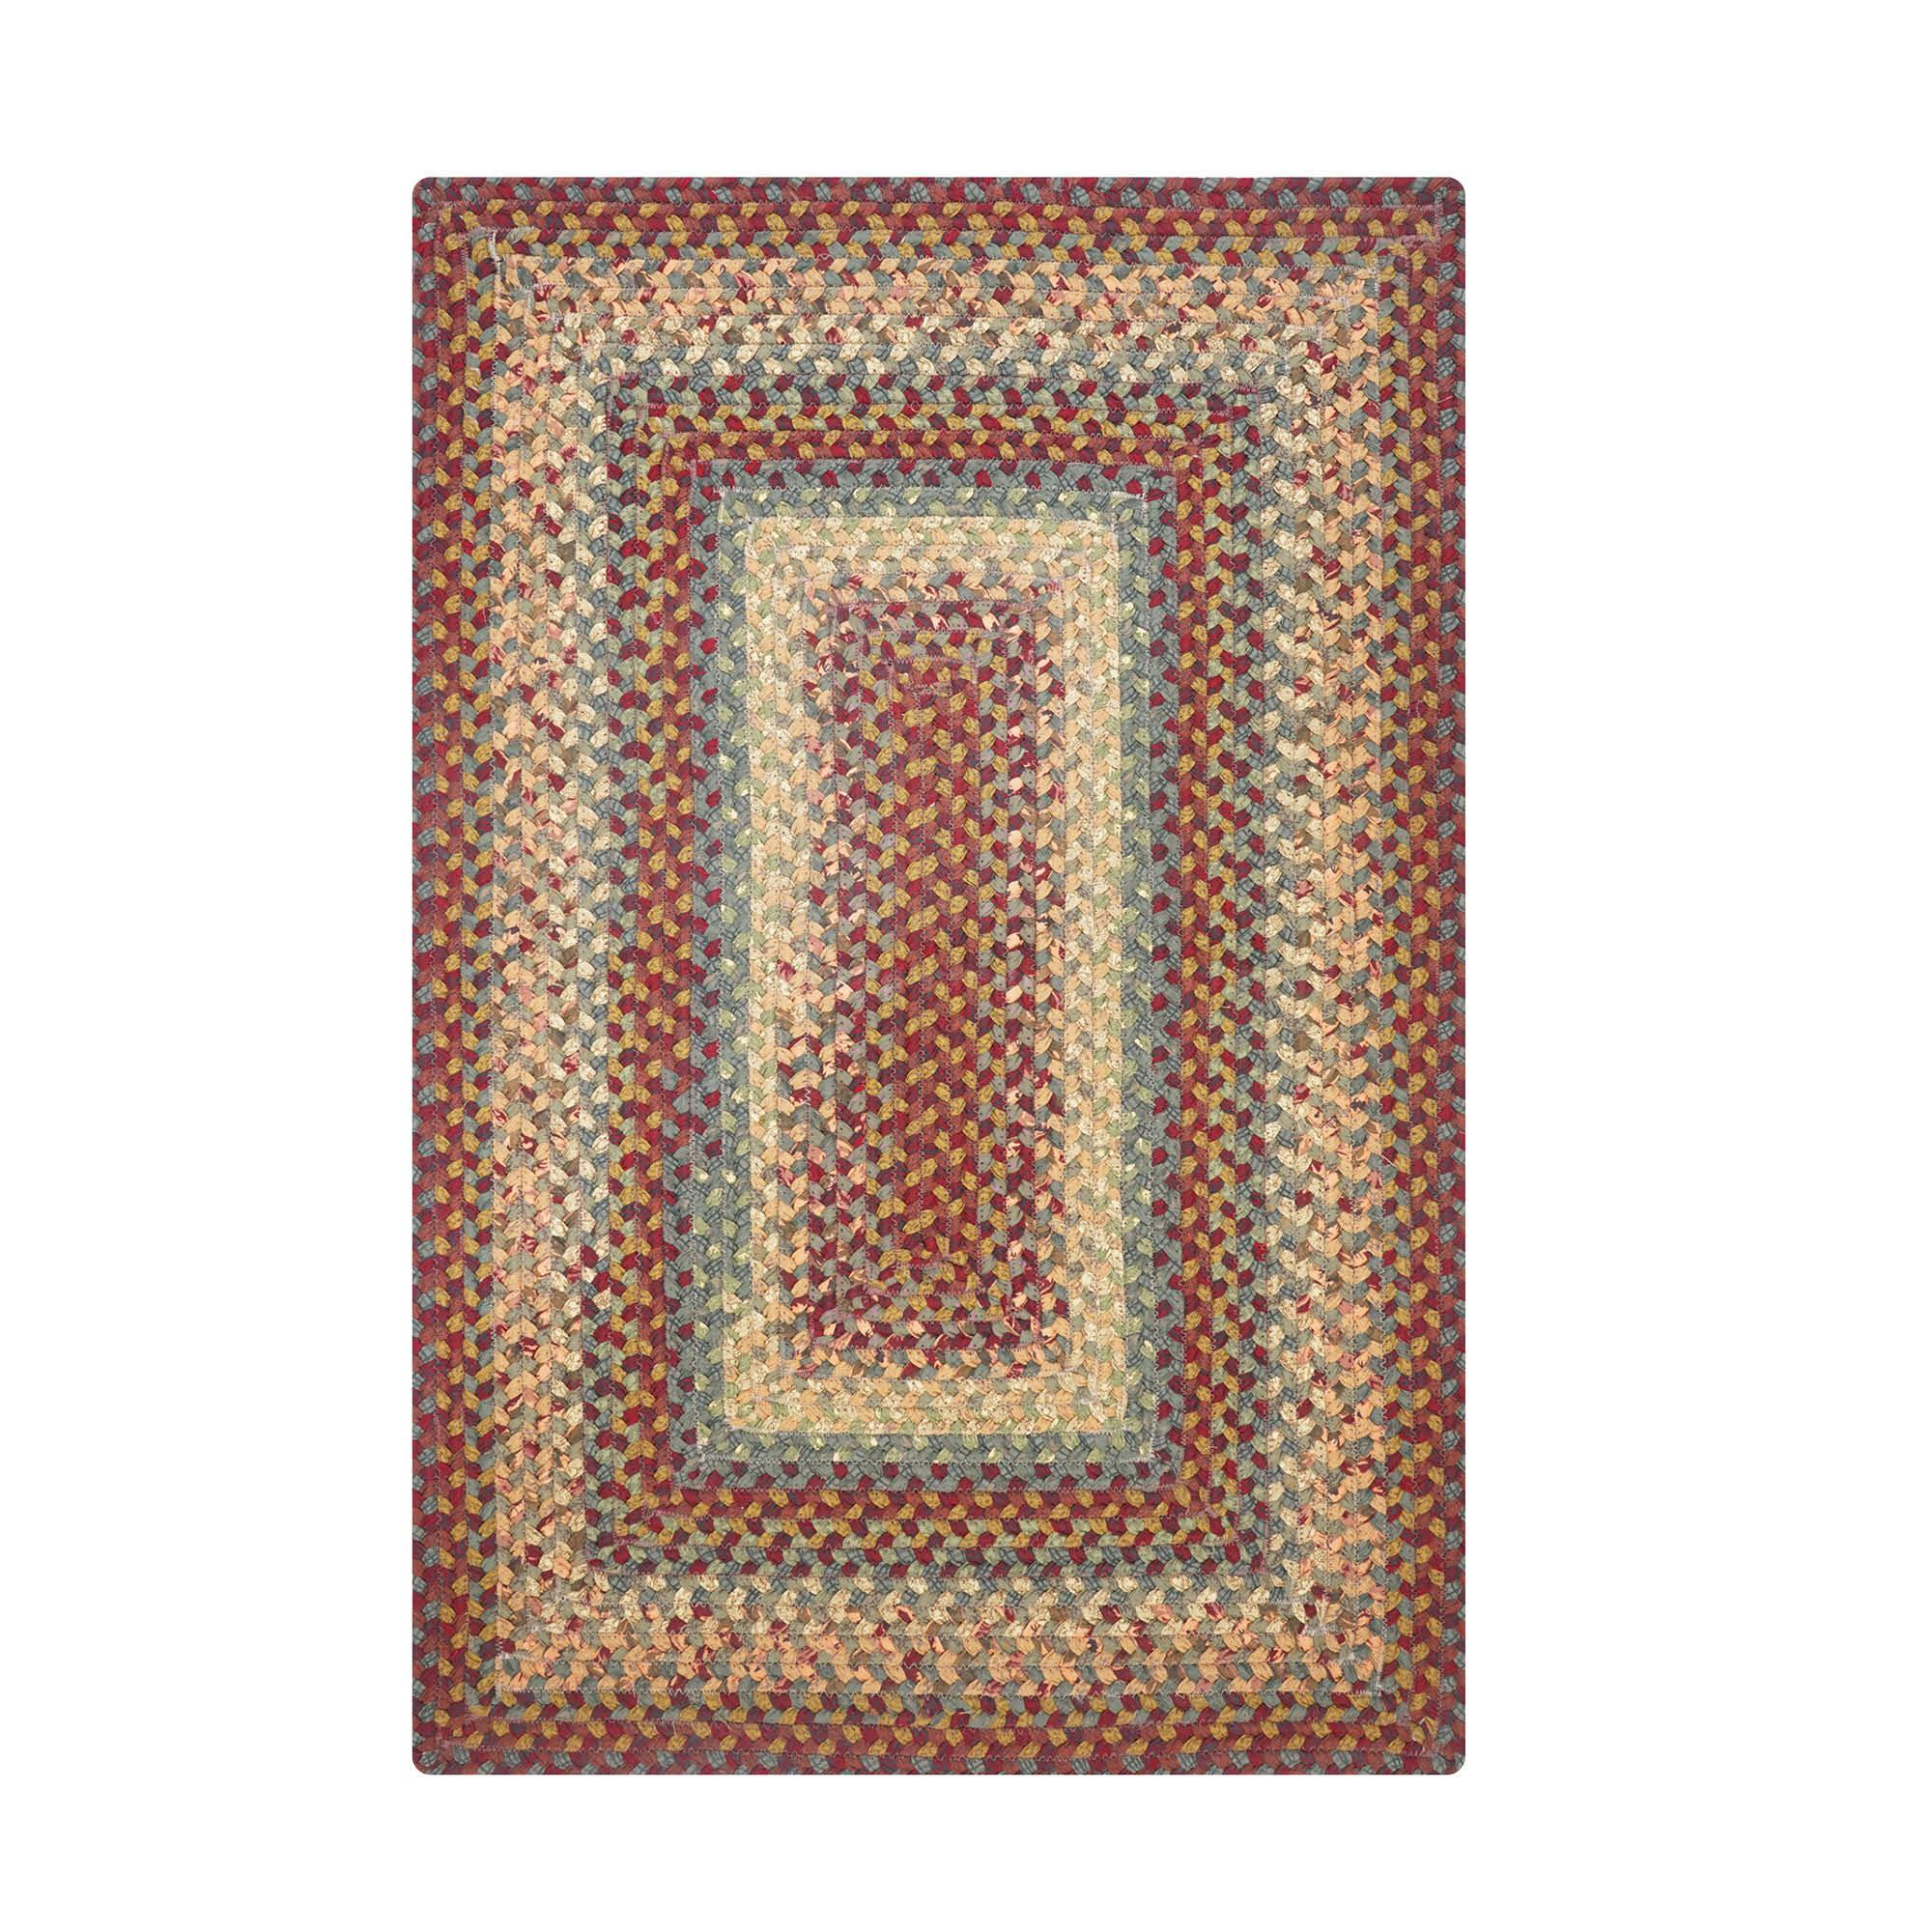 August Grove Kincade Geometric Braided Cotton Red Green Mustard Area Rug Reviews Wayfair